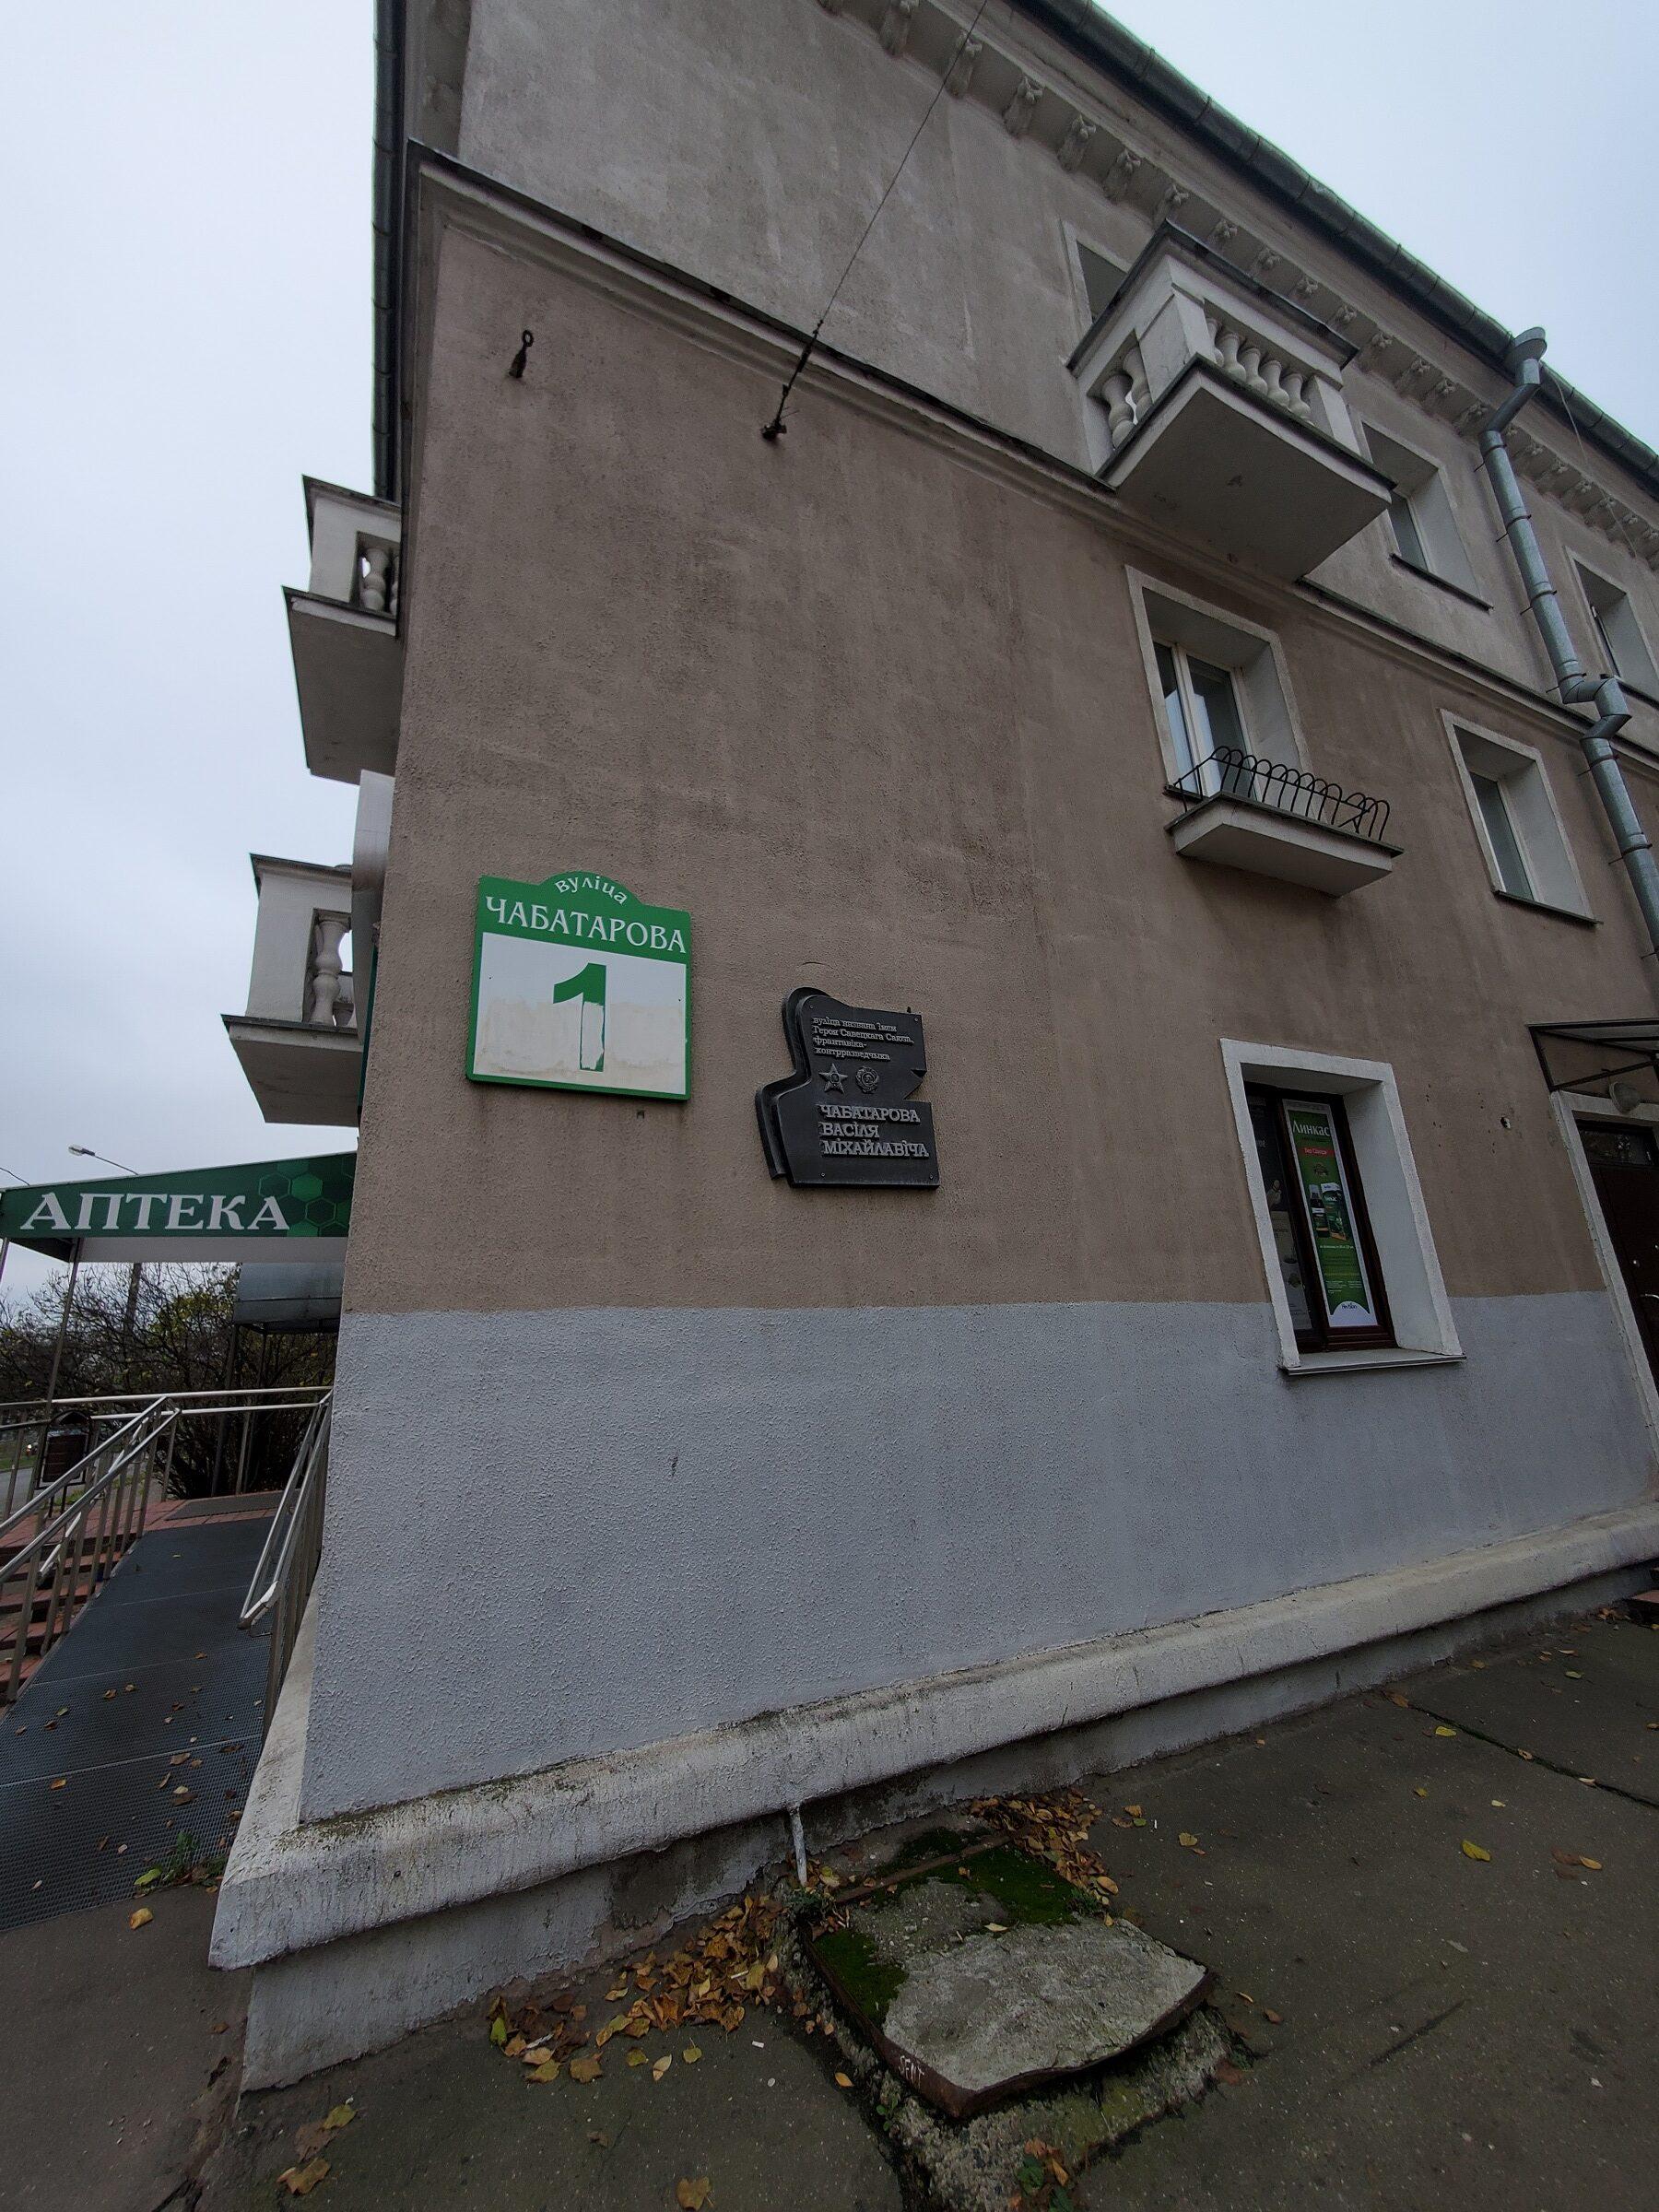 20201107 150719 rotated - Минск. Тракторозаводской поселок